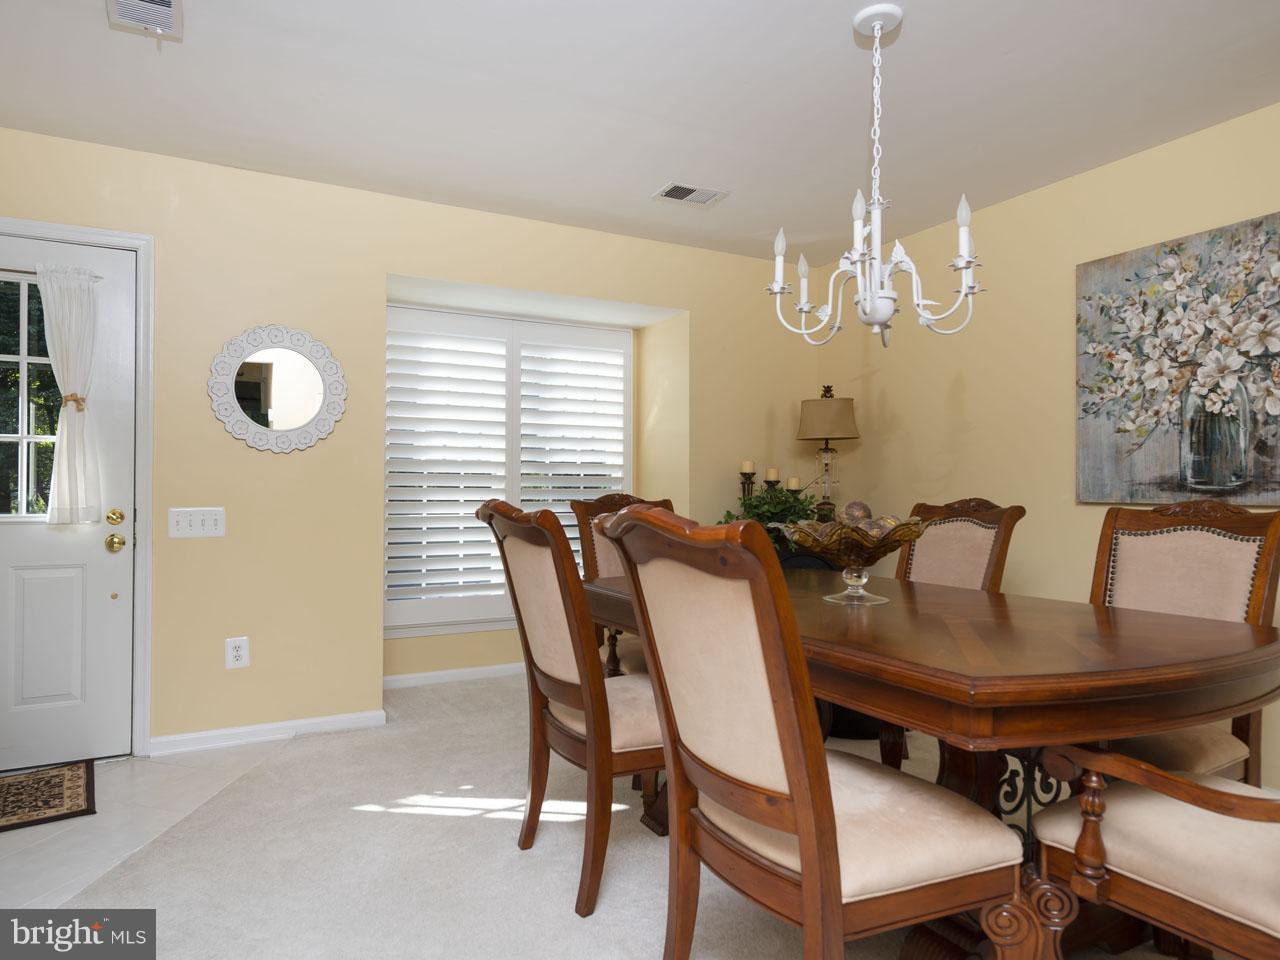 1002640508-300537944323-2021-07-22-05-00-38     Pinecrest   Alexandria Delaware Real Estate For Sale   MLS# 1002640508  - Best of Northern Virginia